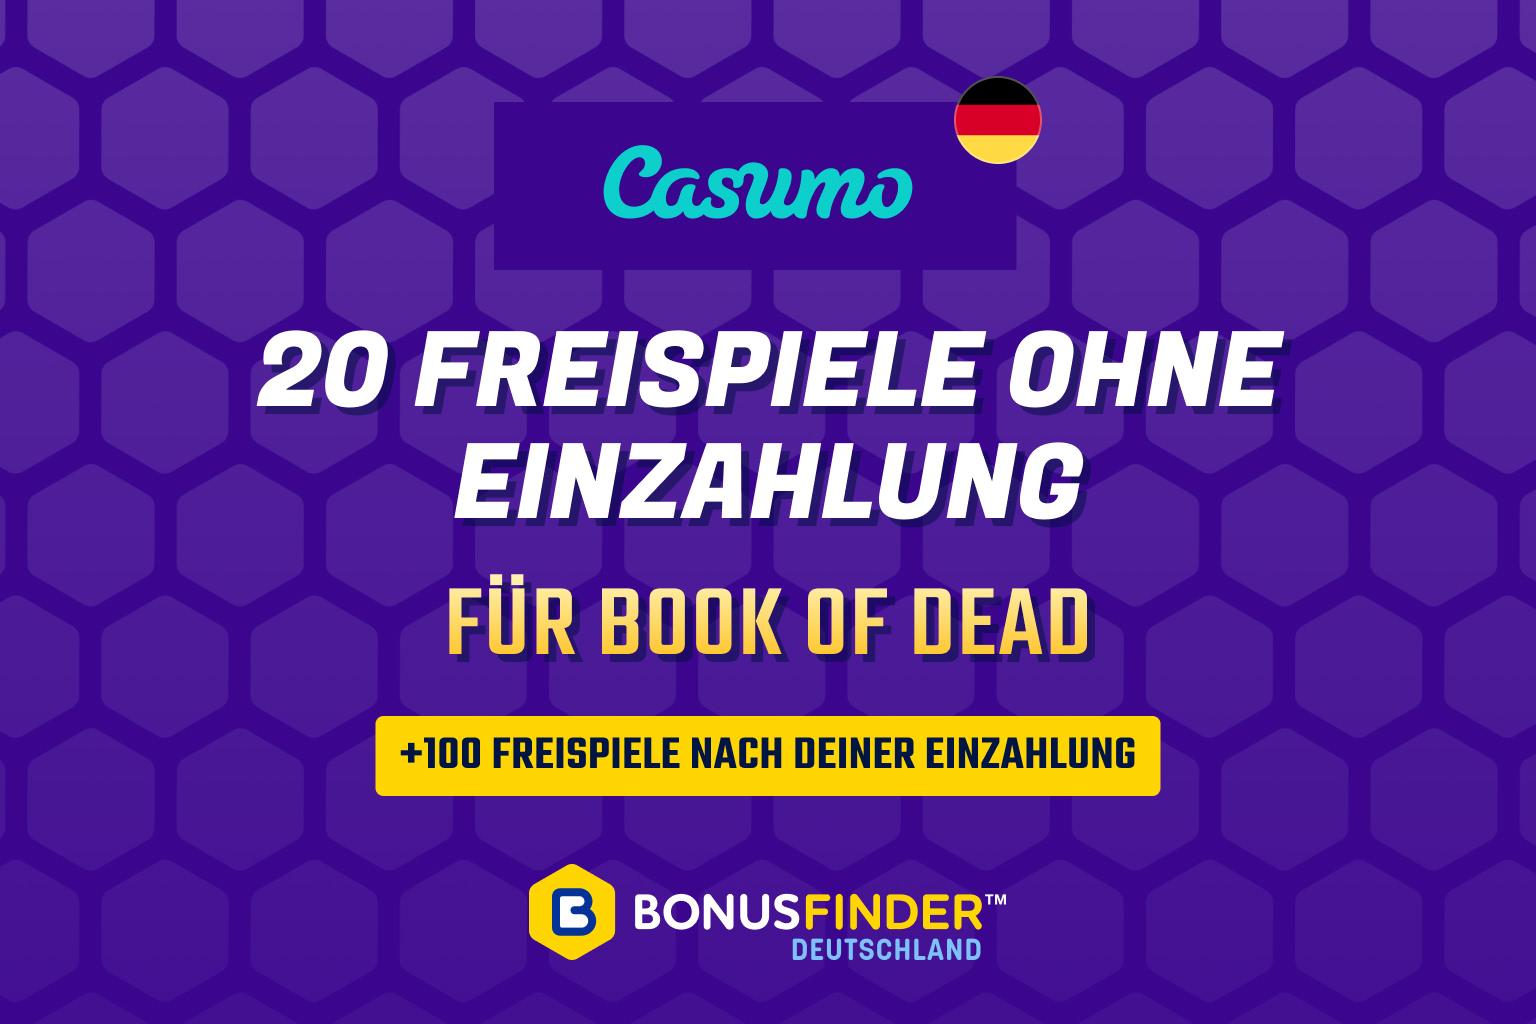 casumo book of dead freispiele